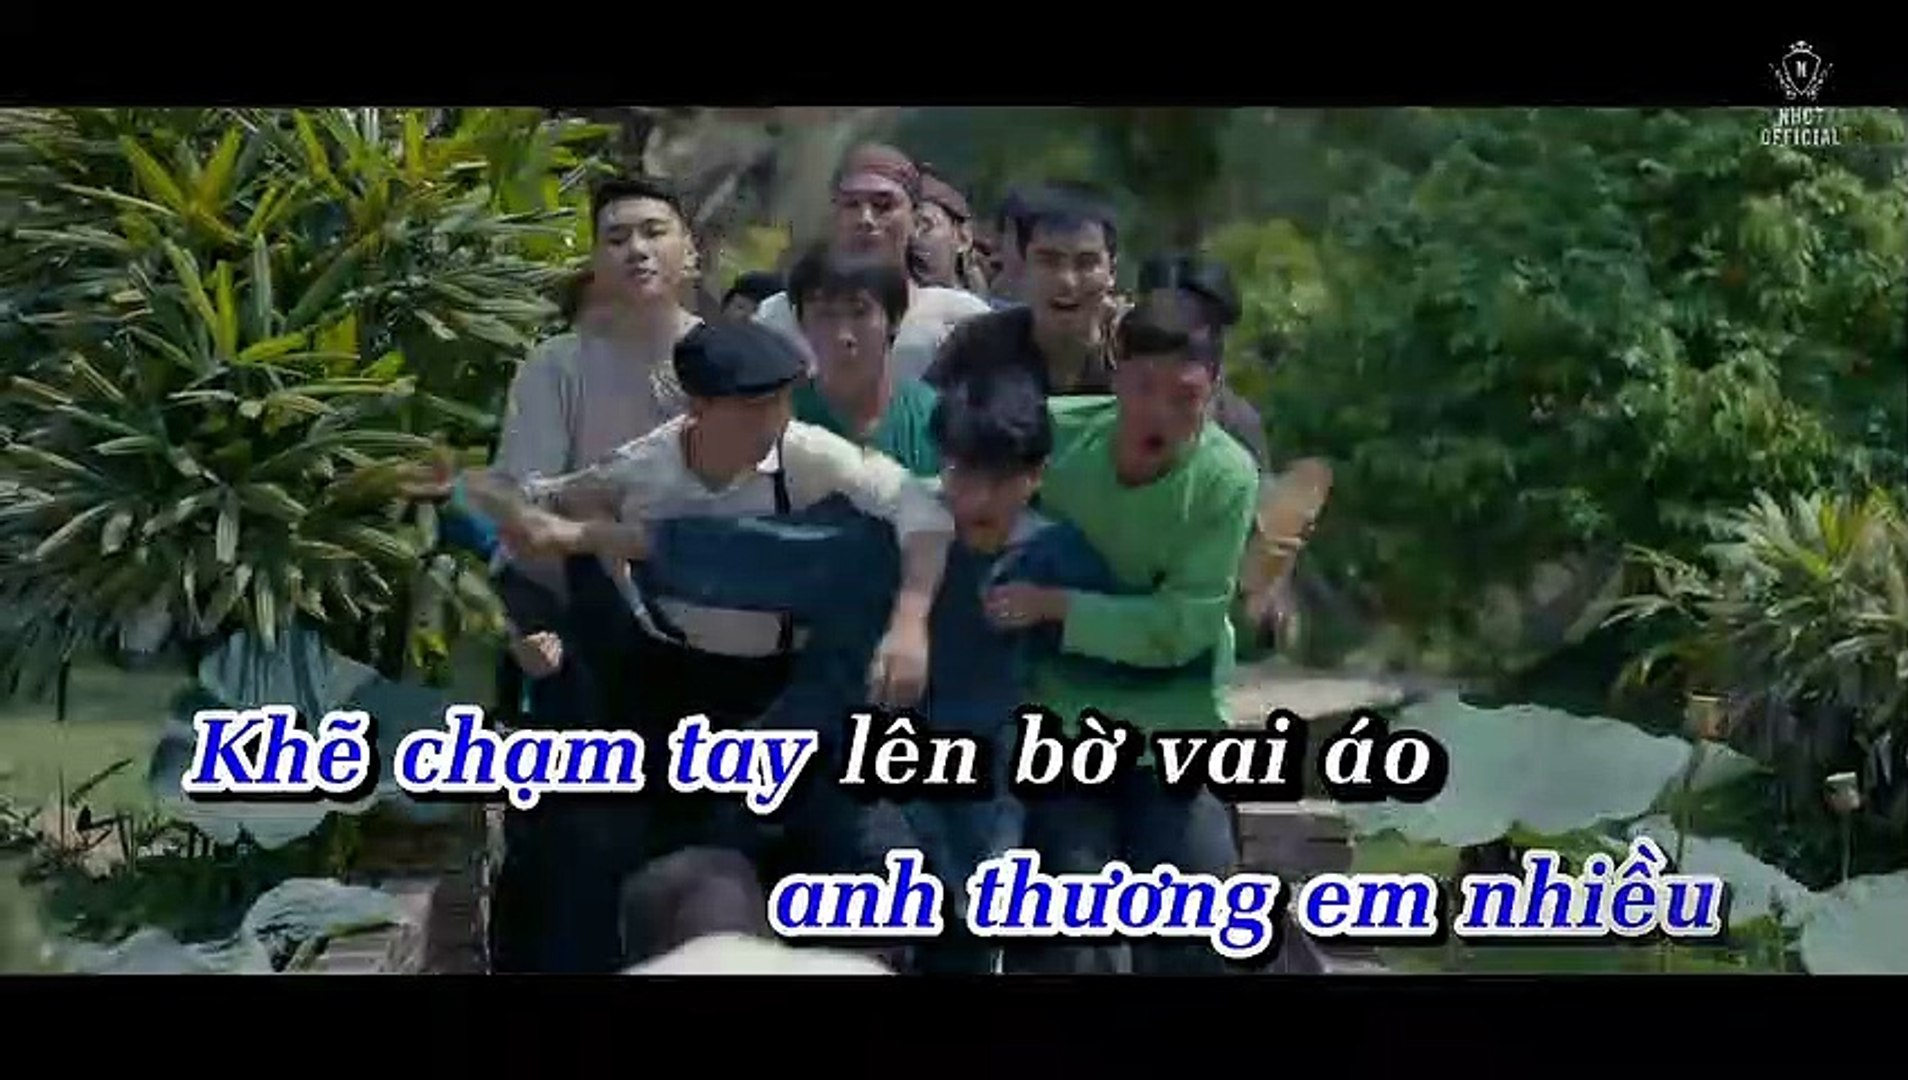 [Karaoke] Tỏ Tình - Jang Nguyễn Ft. K-ICM [Beat Tone Nữ]